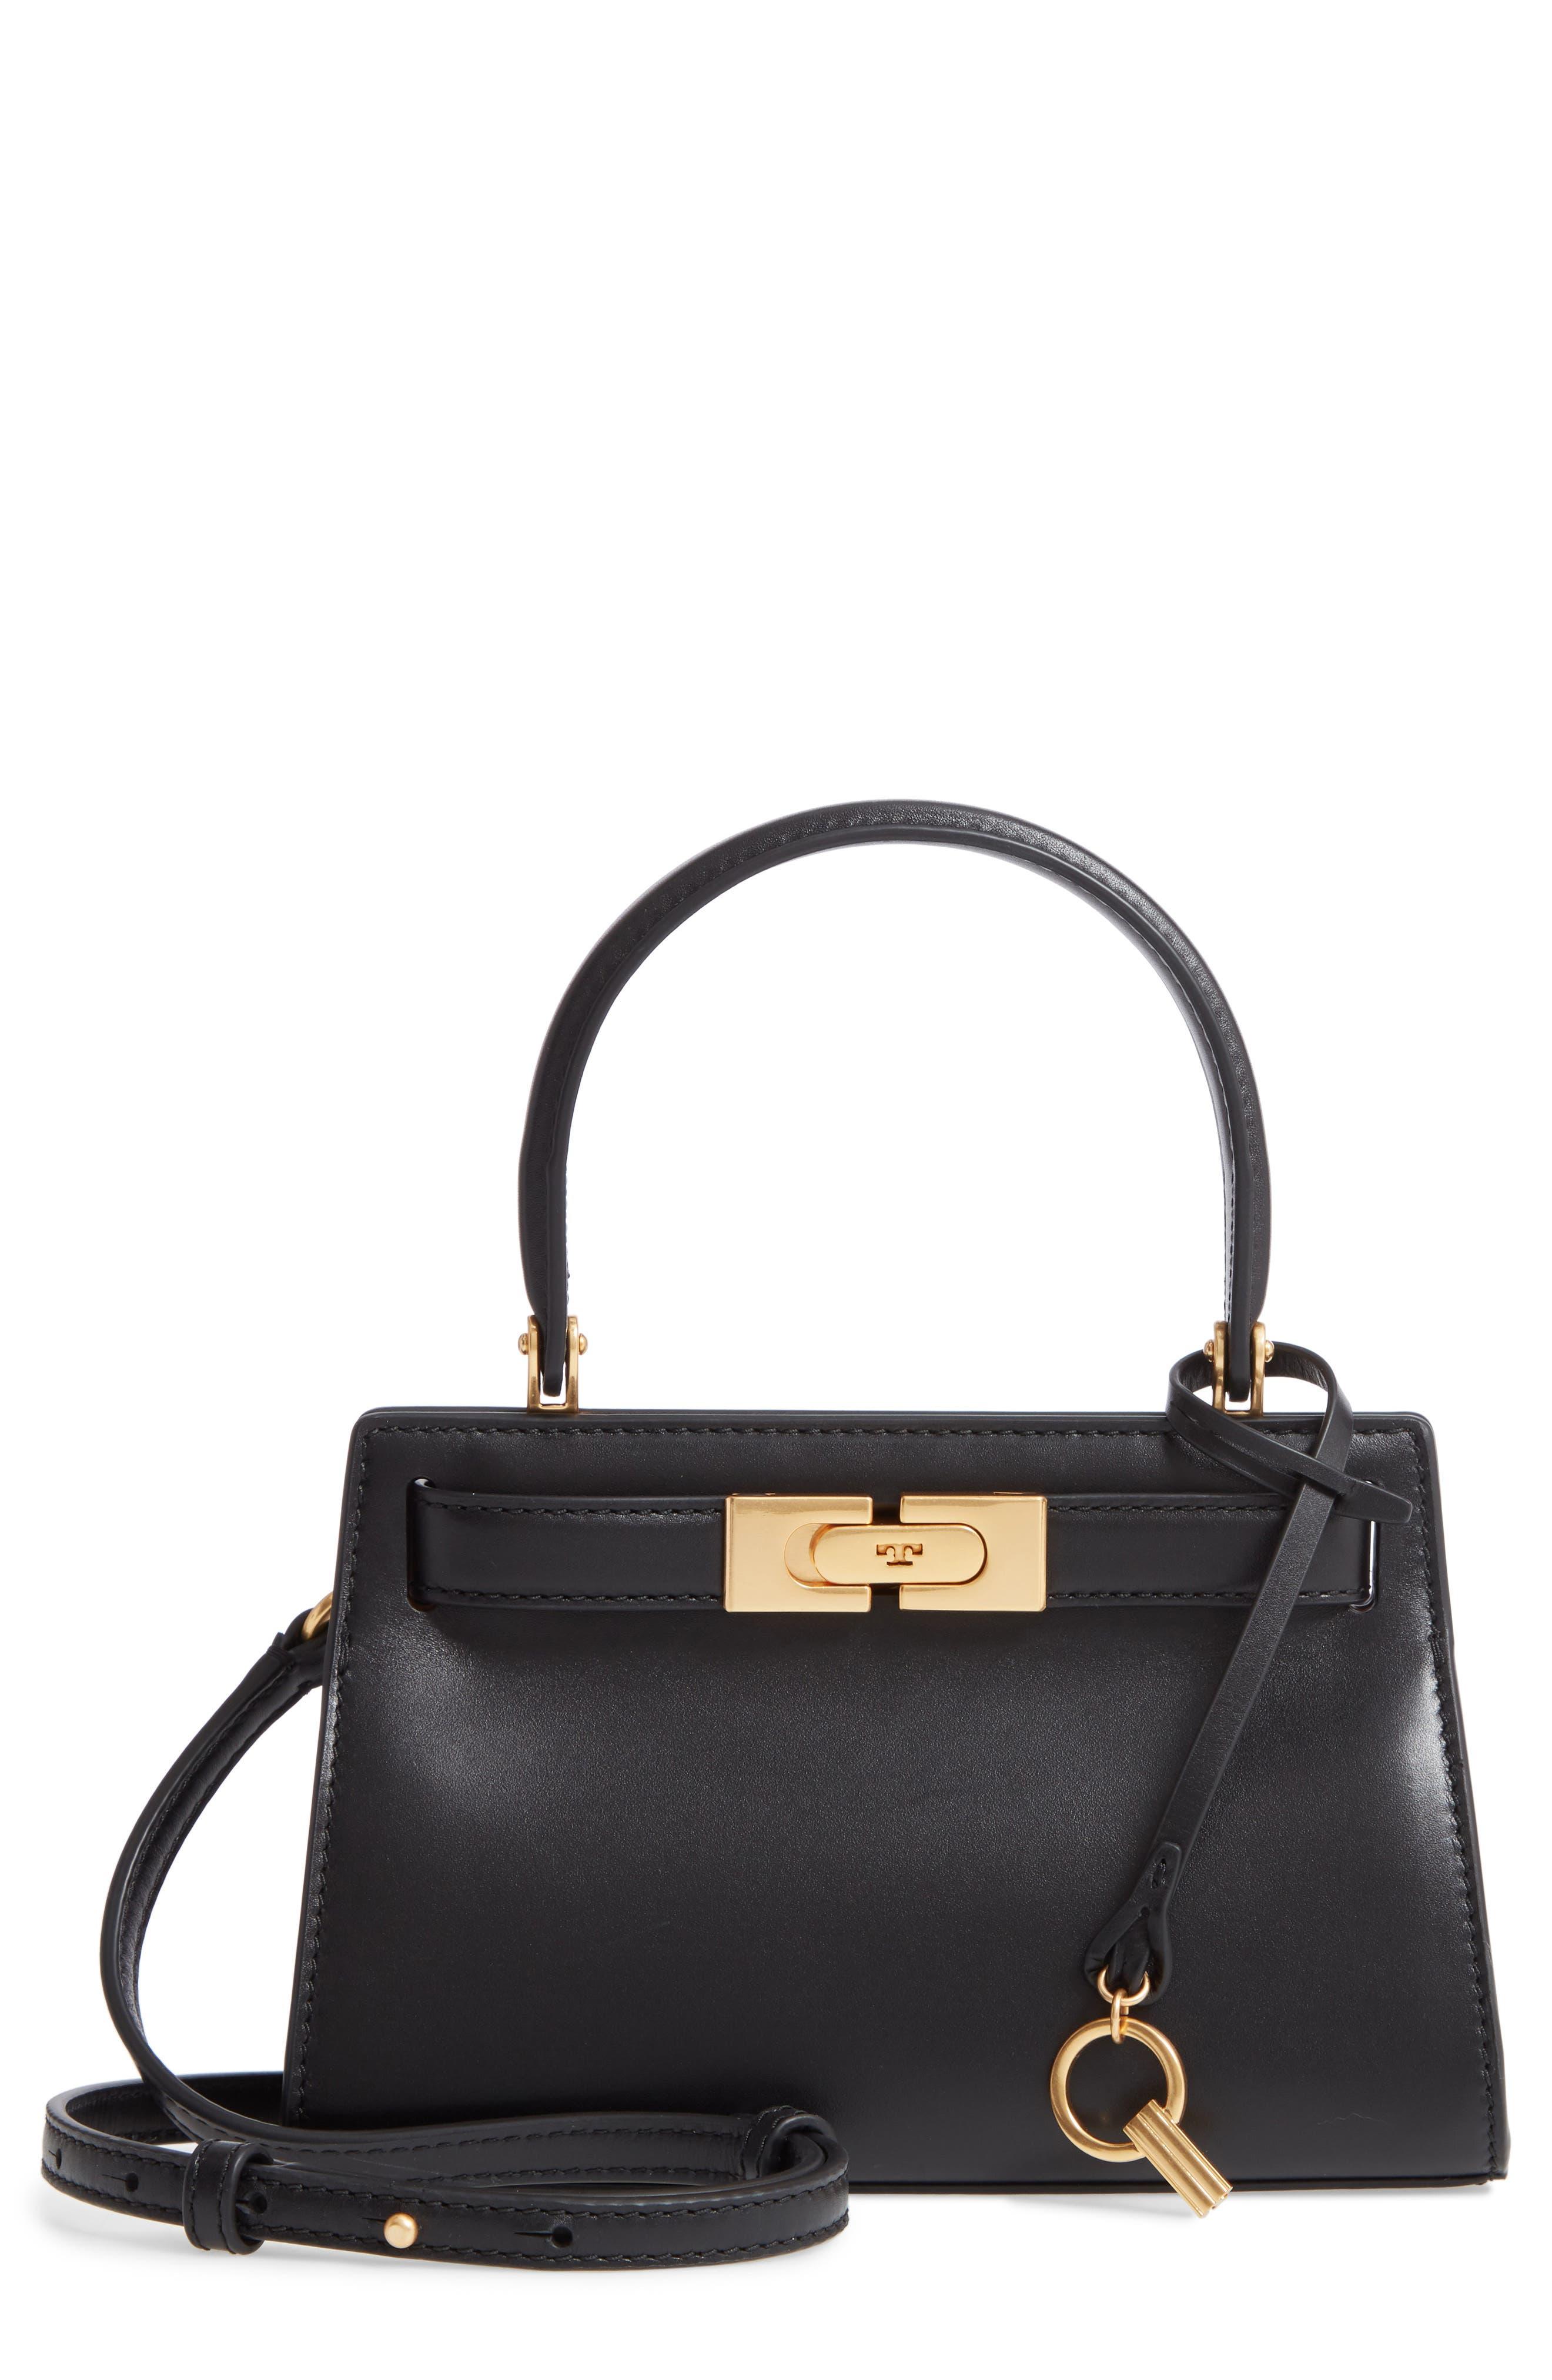 TORY BURCH, Mini Lee Radziwill Leather Bag, Main thumbnail 1, color, BLACK